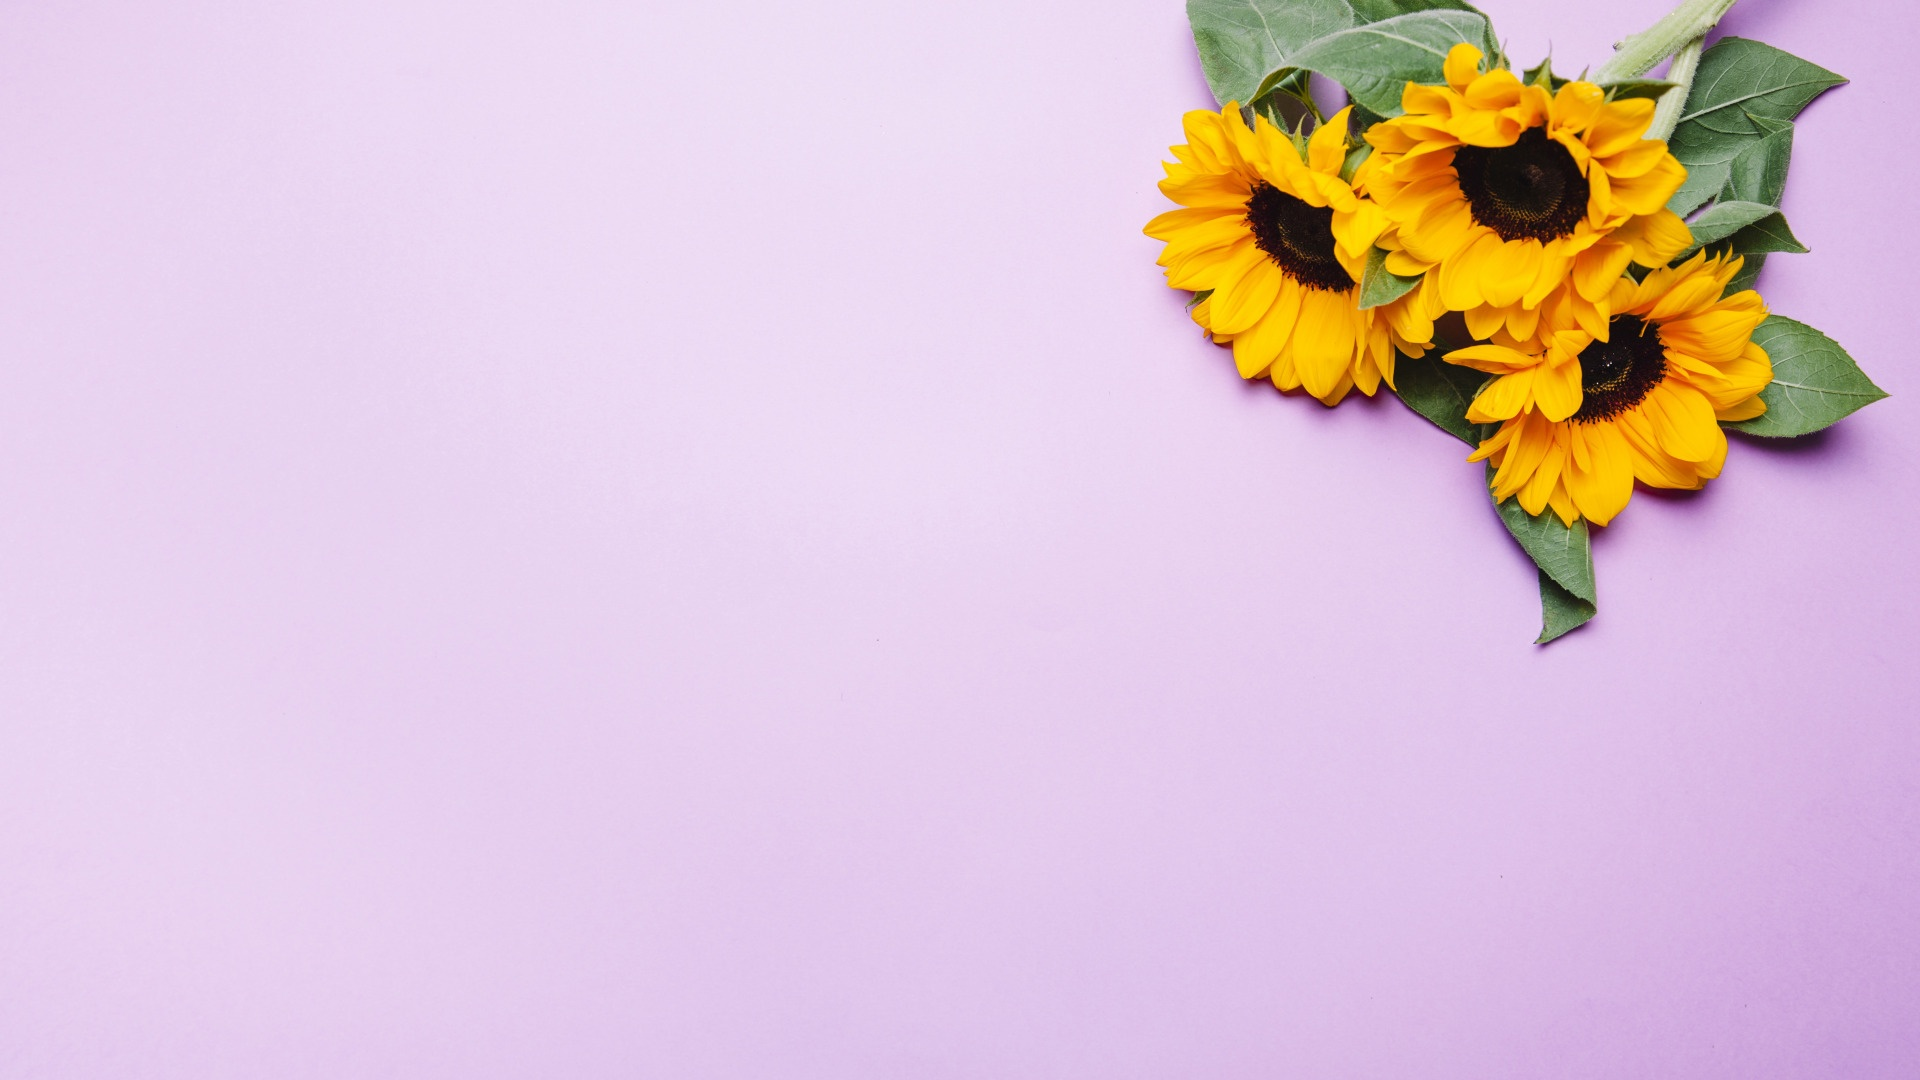 Sunflower best picture